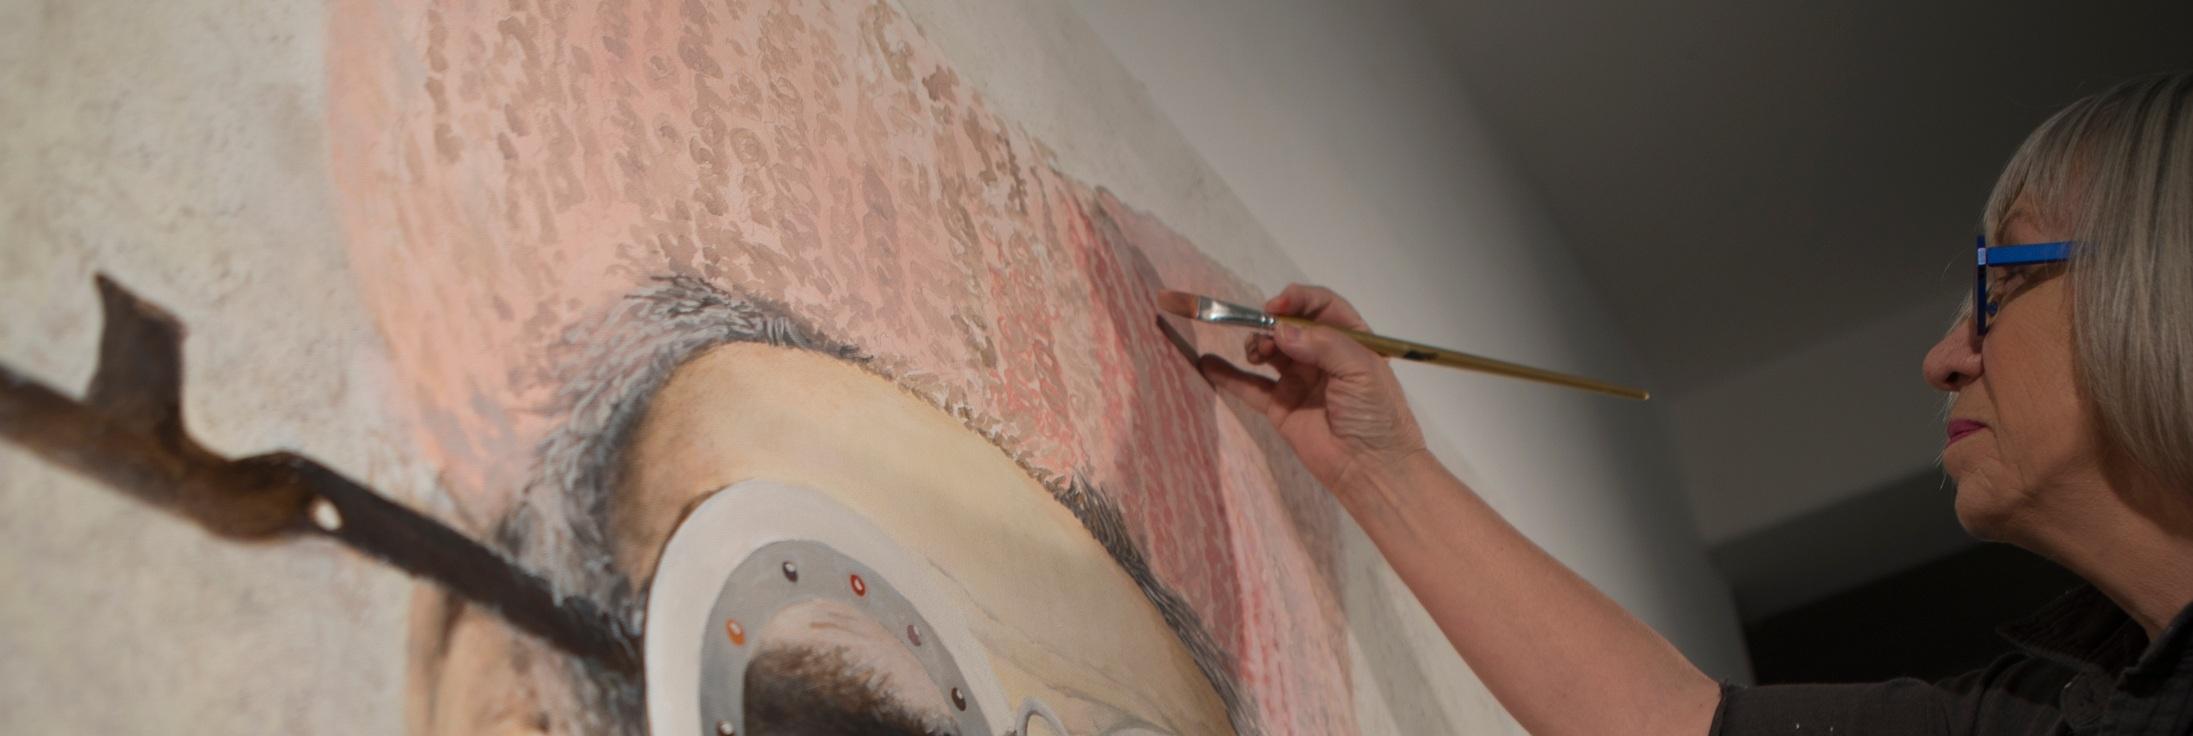 Coates-painting+in+studio.jpg